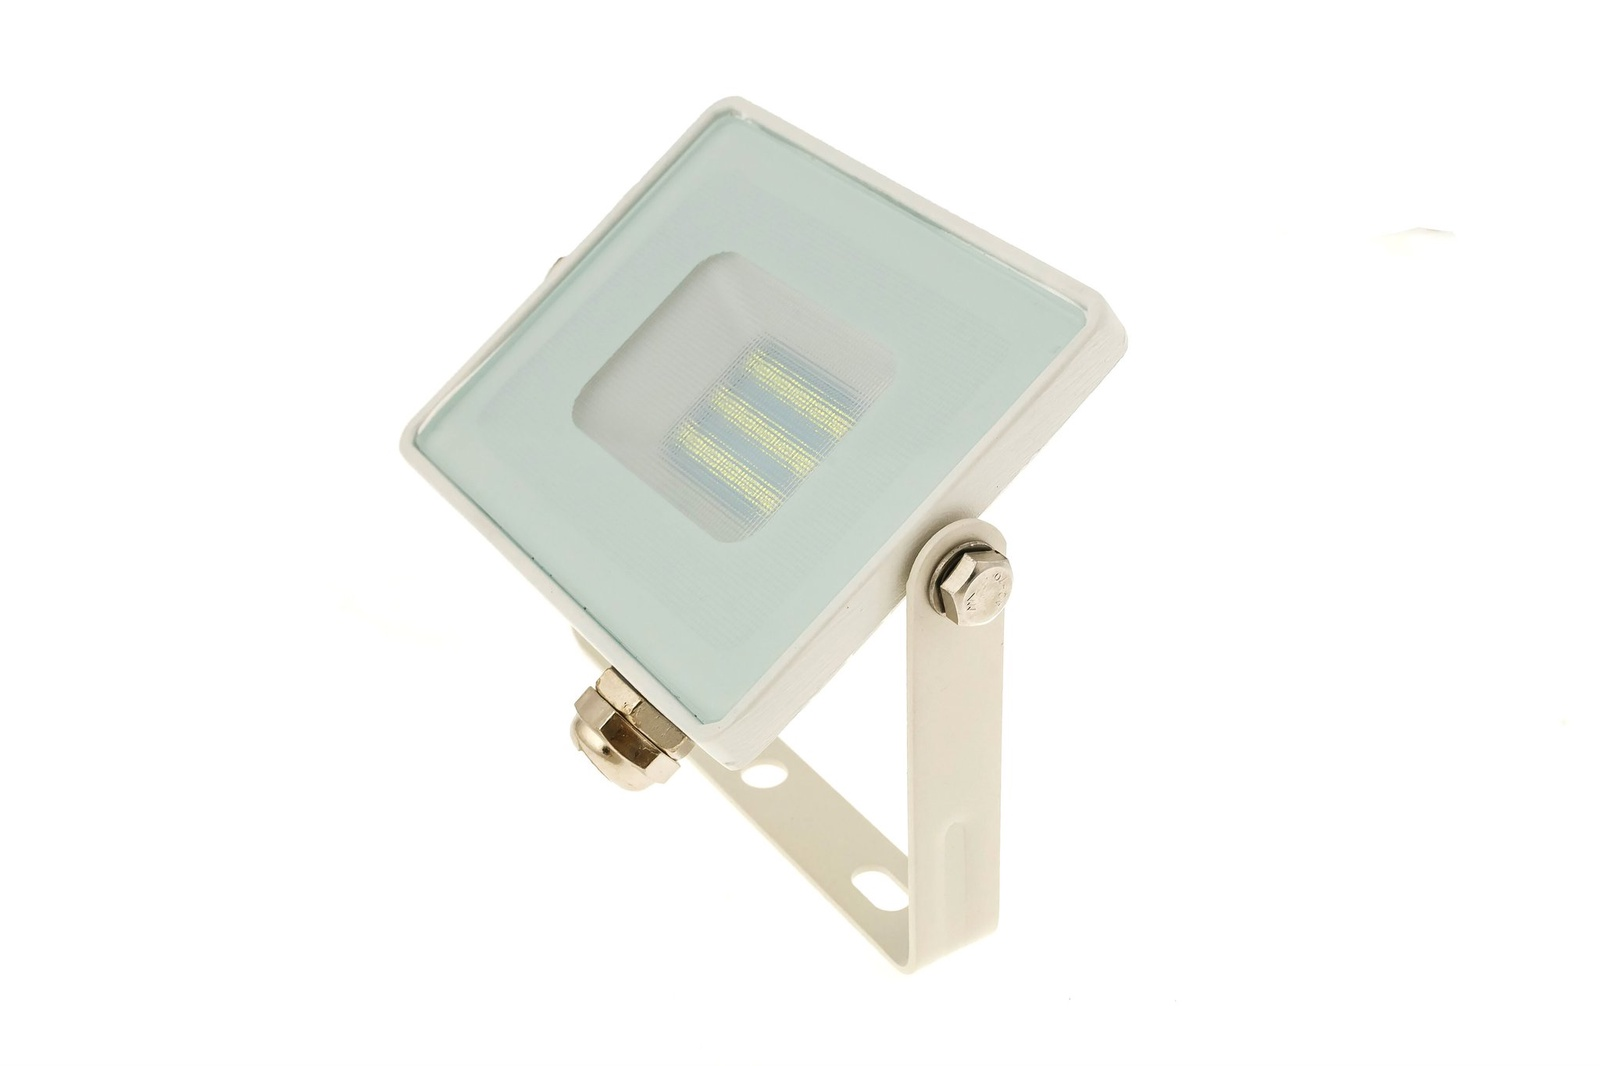 Прожектор Feron Светодиодный прожектор Feron LL-919 белый, 20 Вт светодиодный прожектор ip65 50w желтый feron ll 275 12204